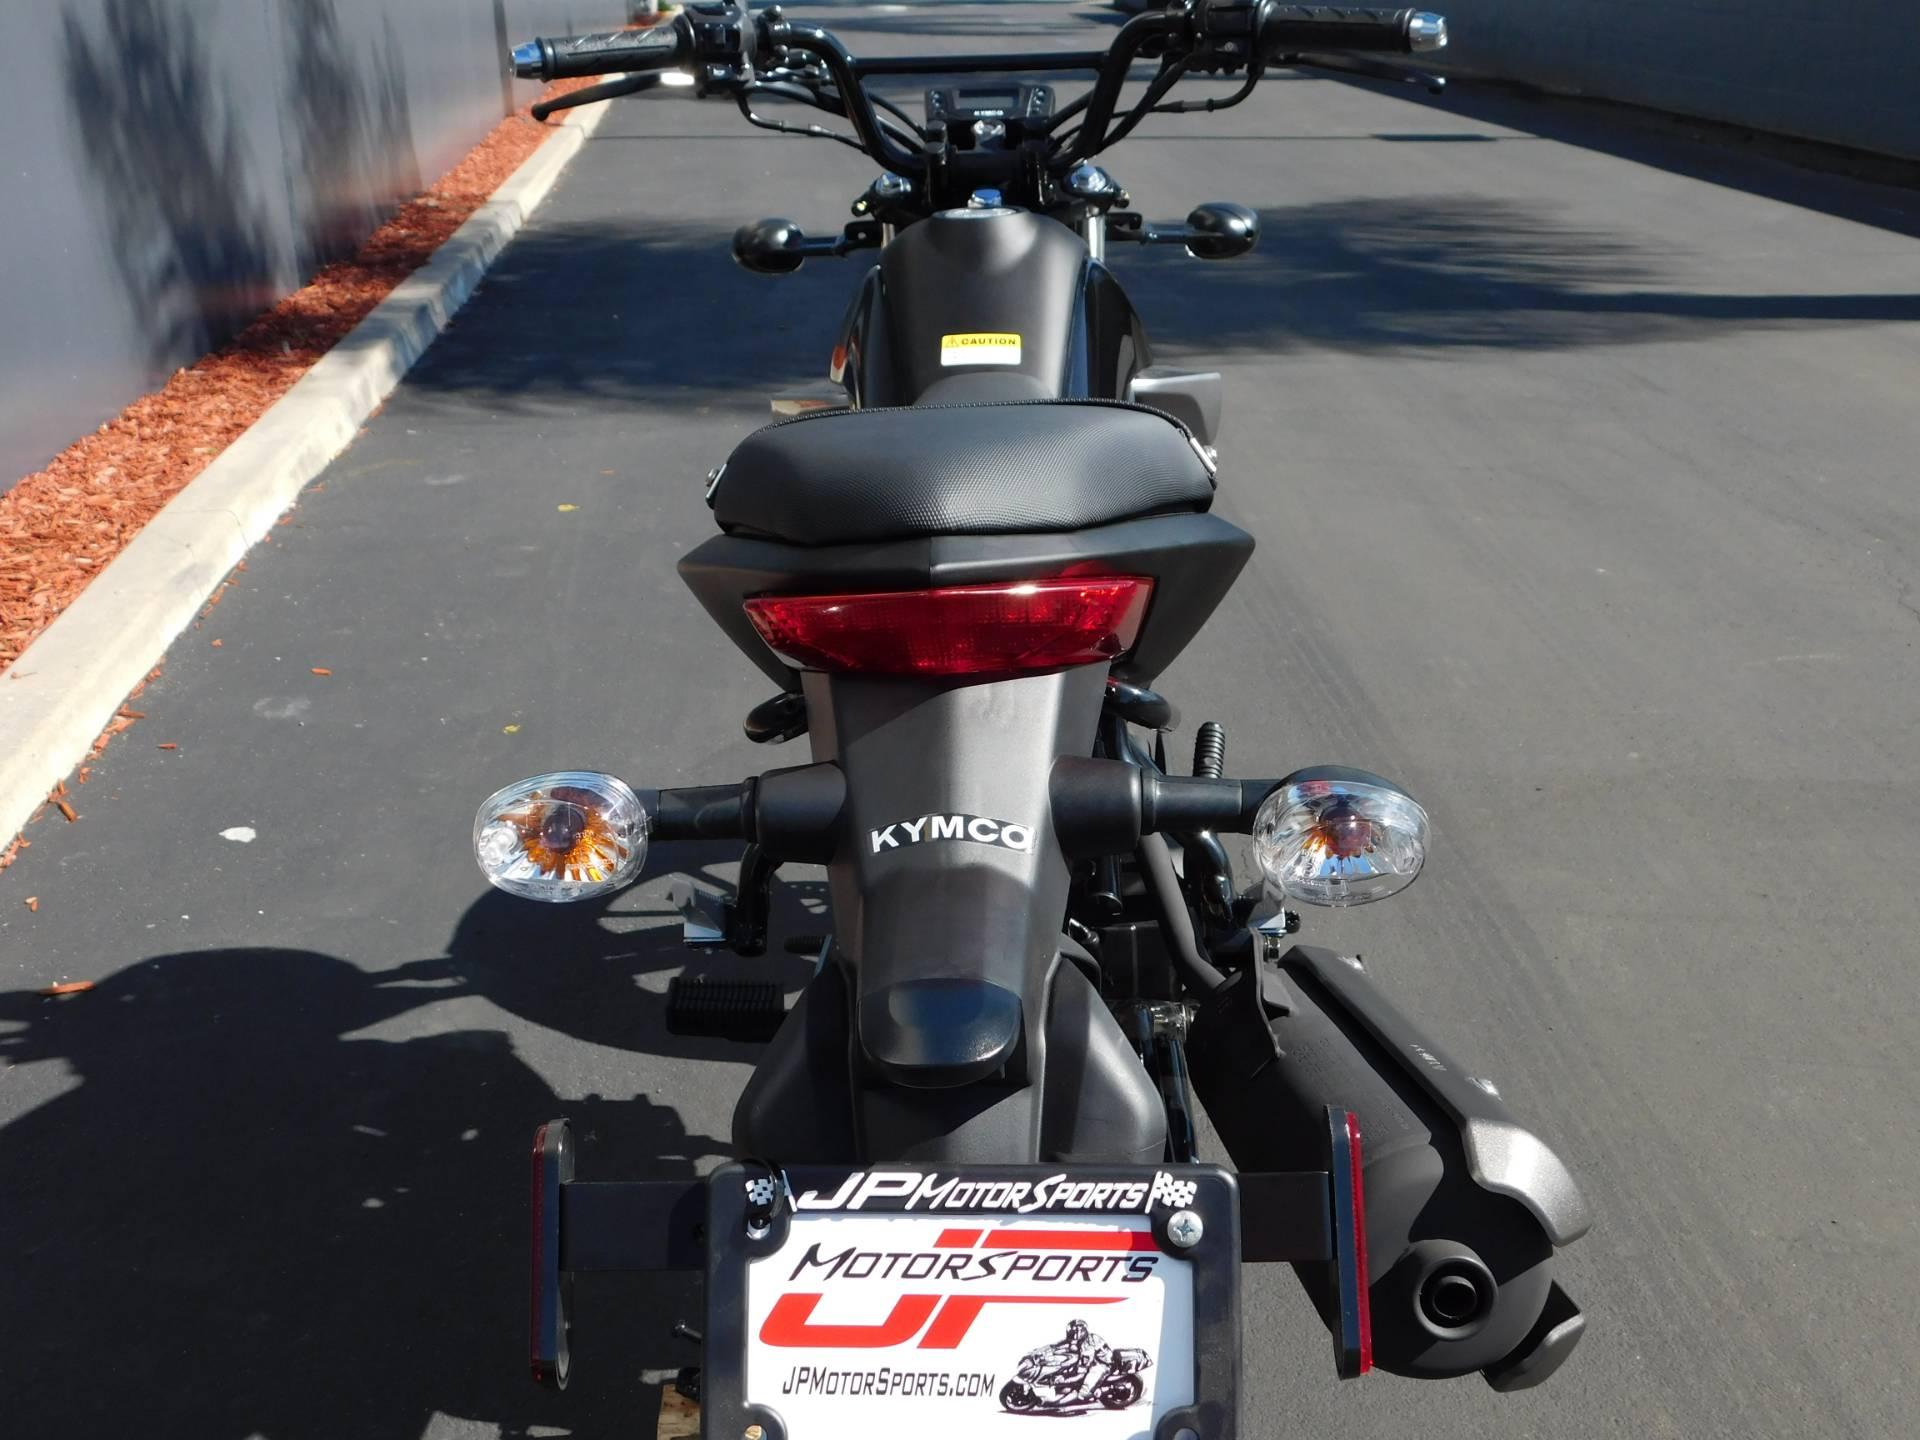 new 2017 kymco k-pipe 125 motorcycles in chula vista, ca | stock